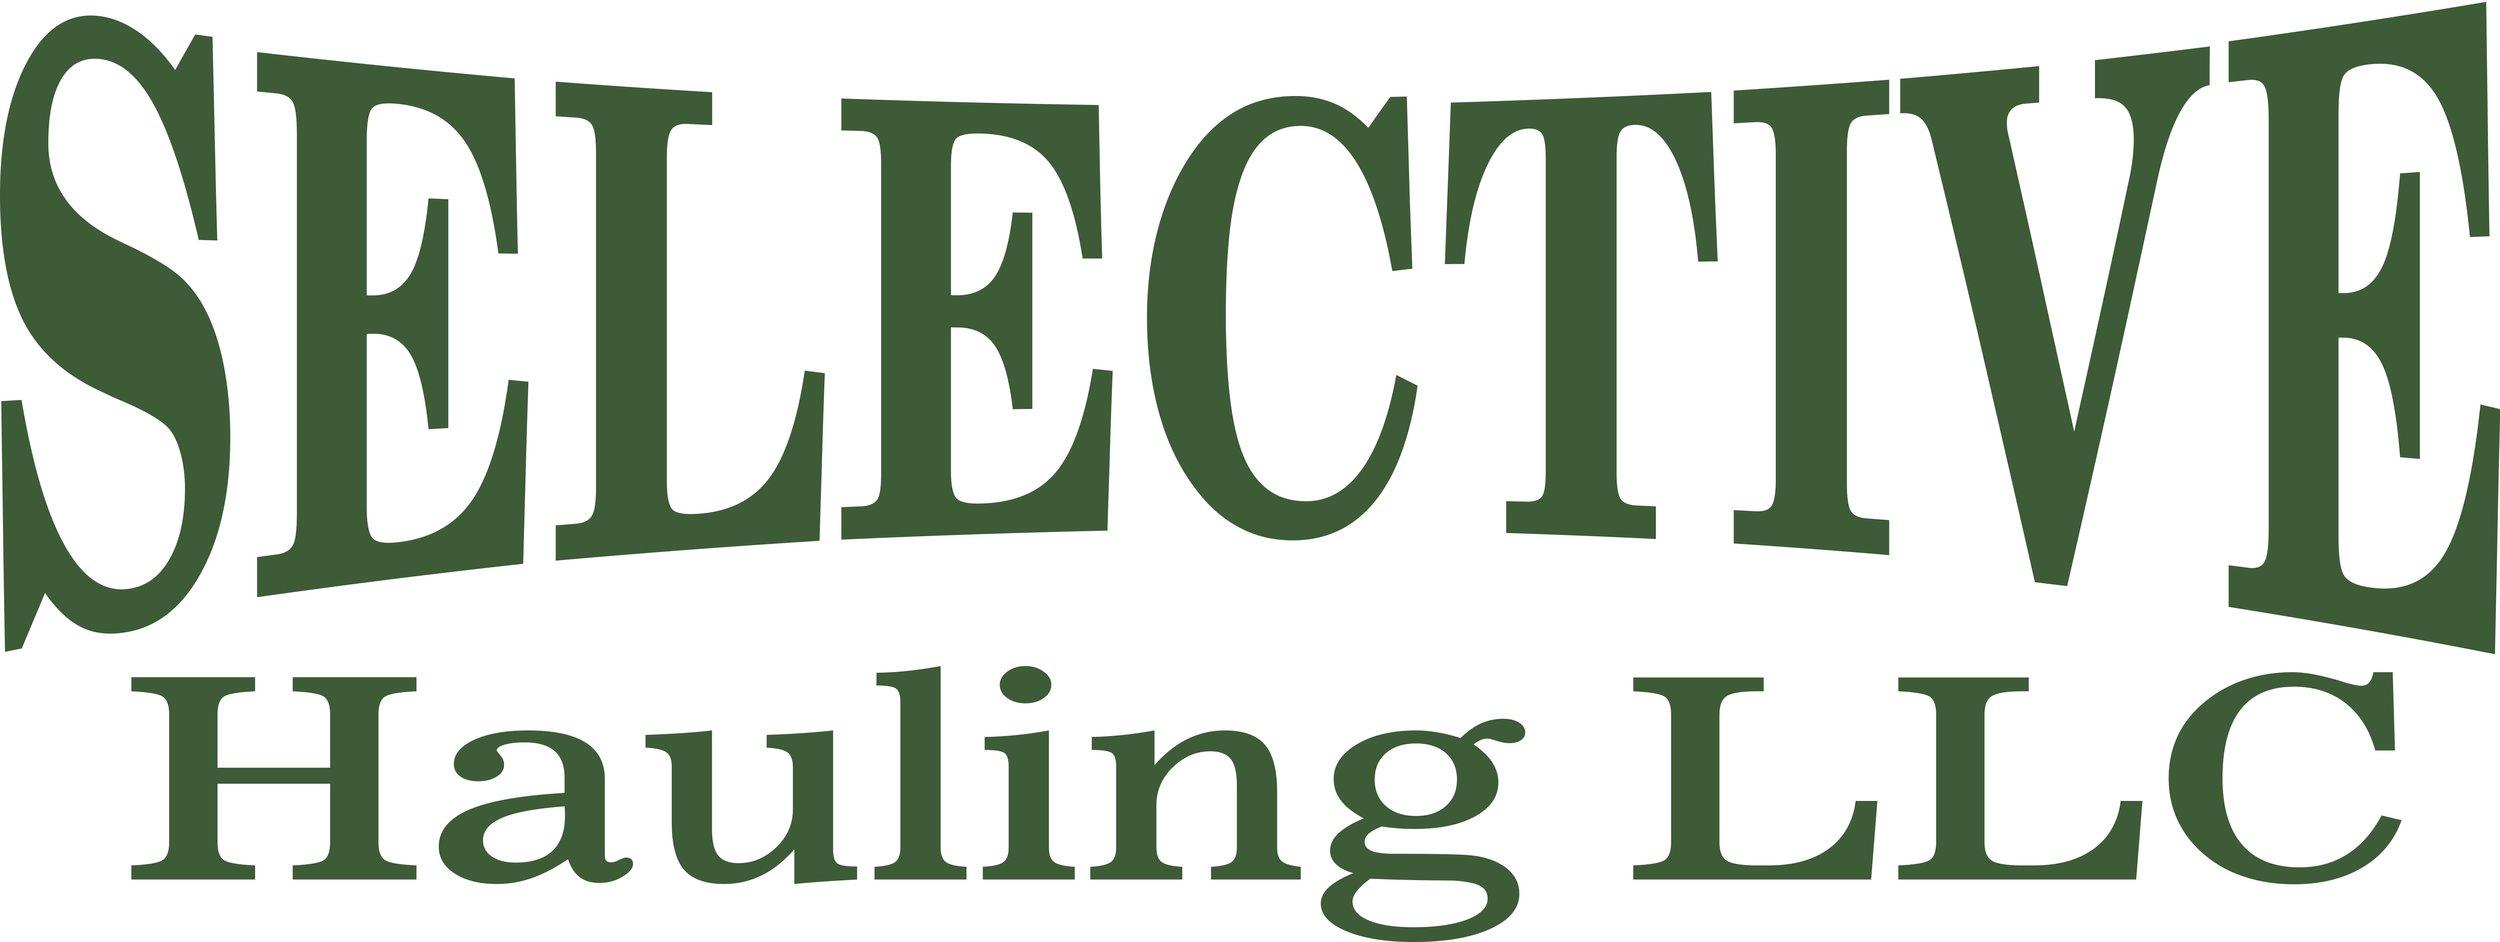 selectivehauling-logo.jpg